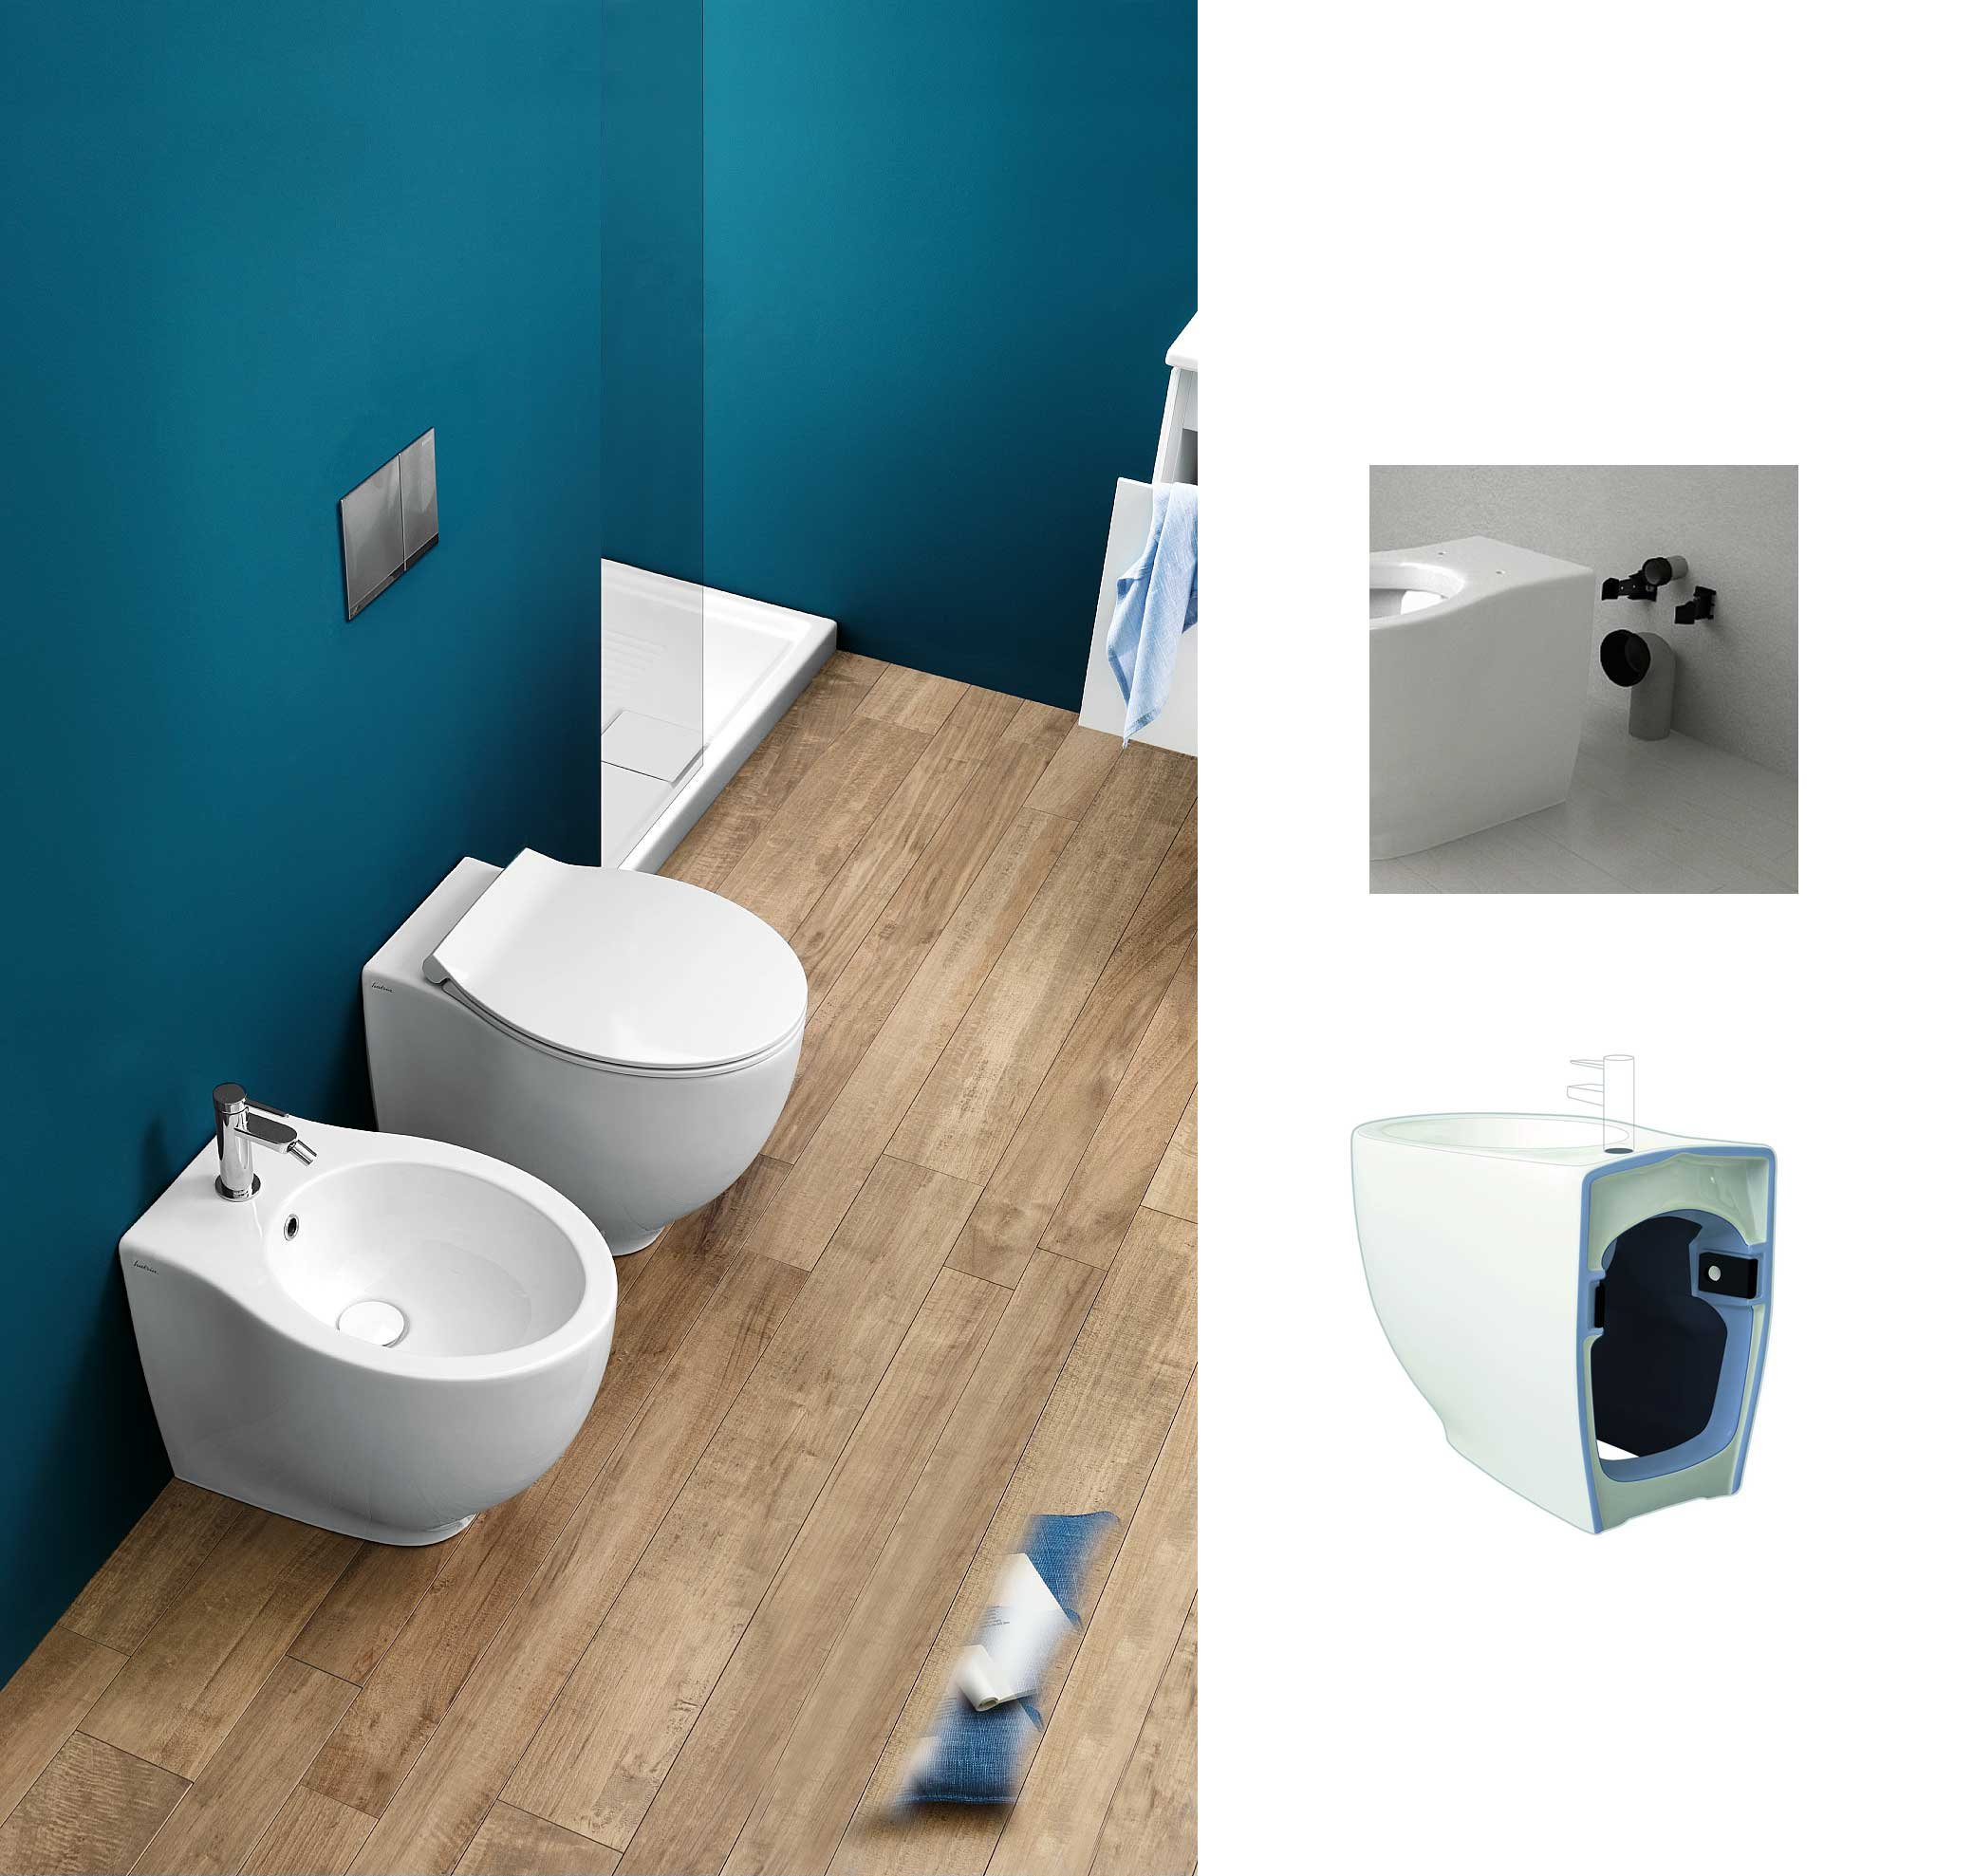 Bagno: 20 soluzioni per avere più comfort e funzionalità - Cose di Casa